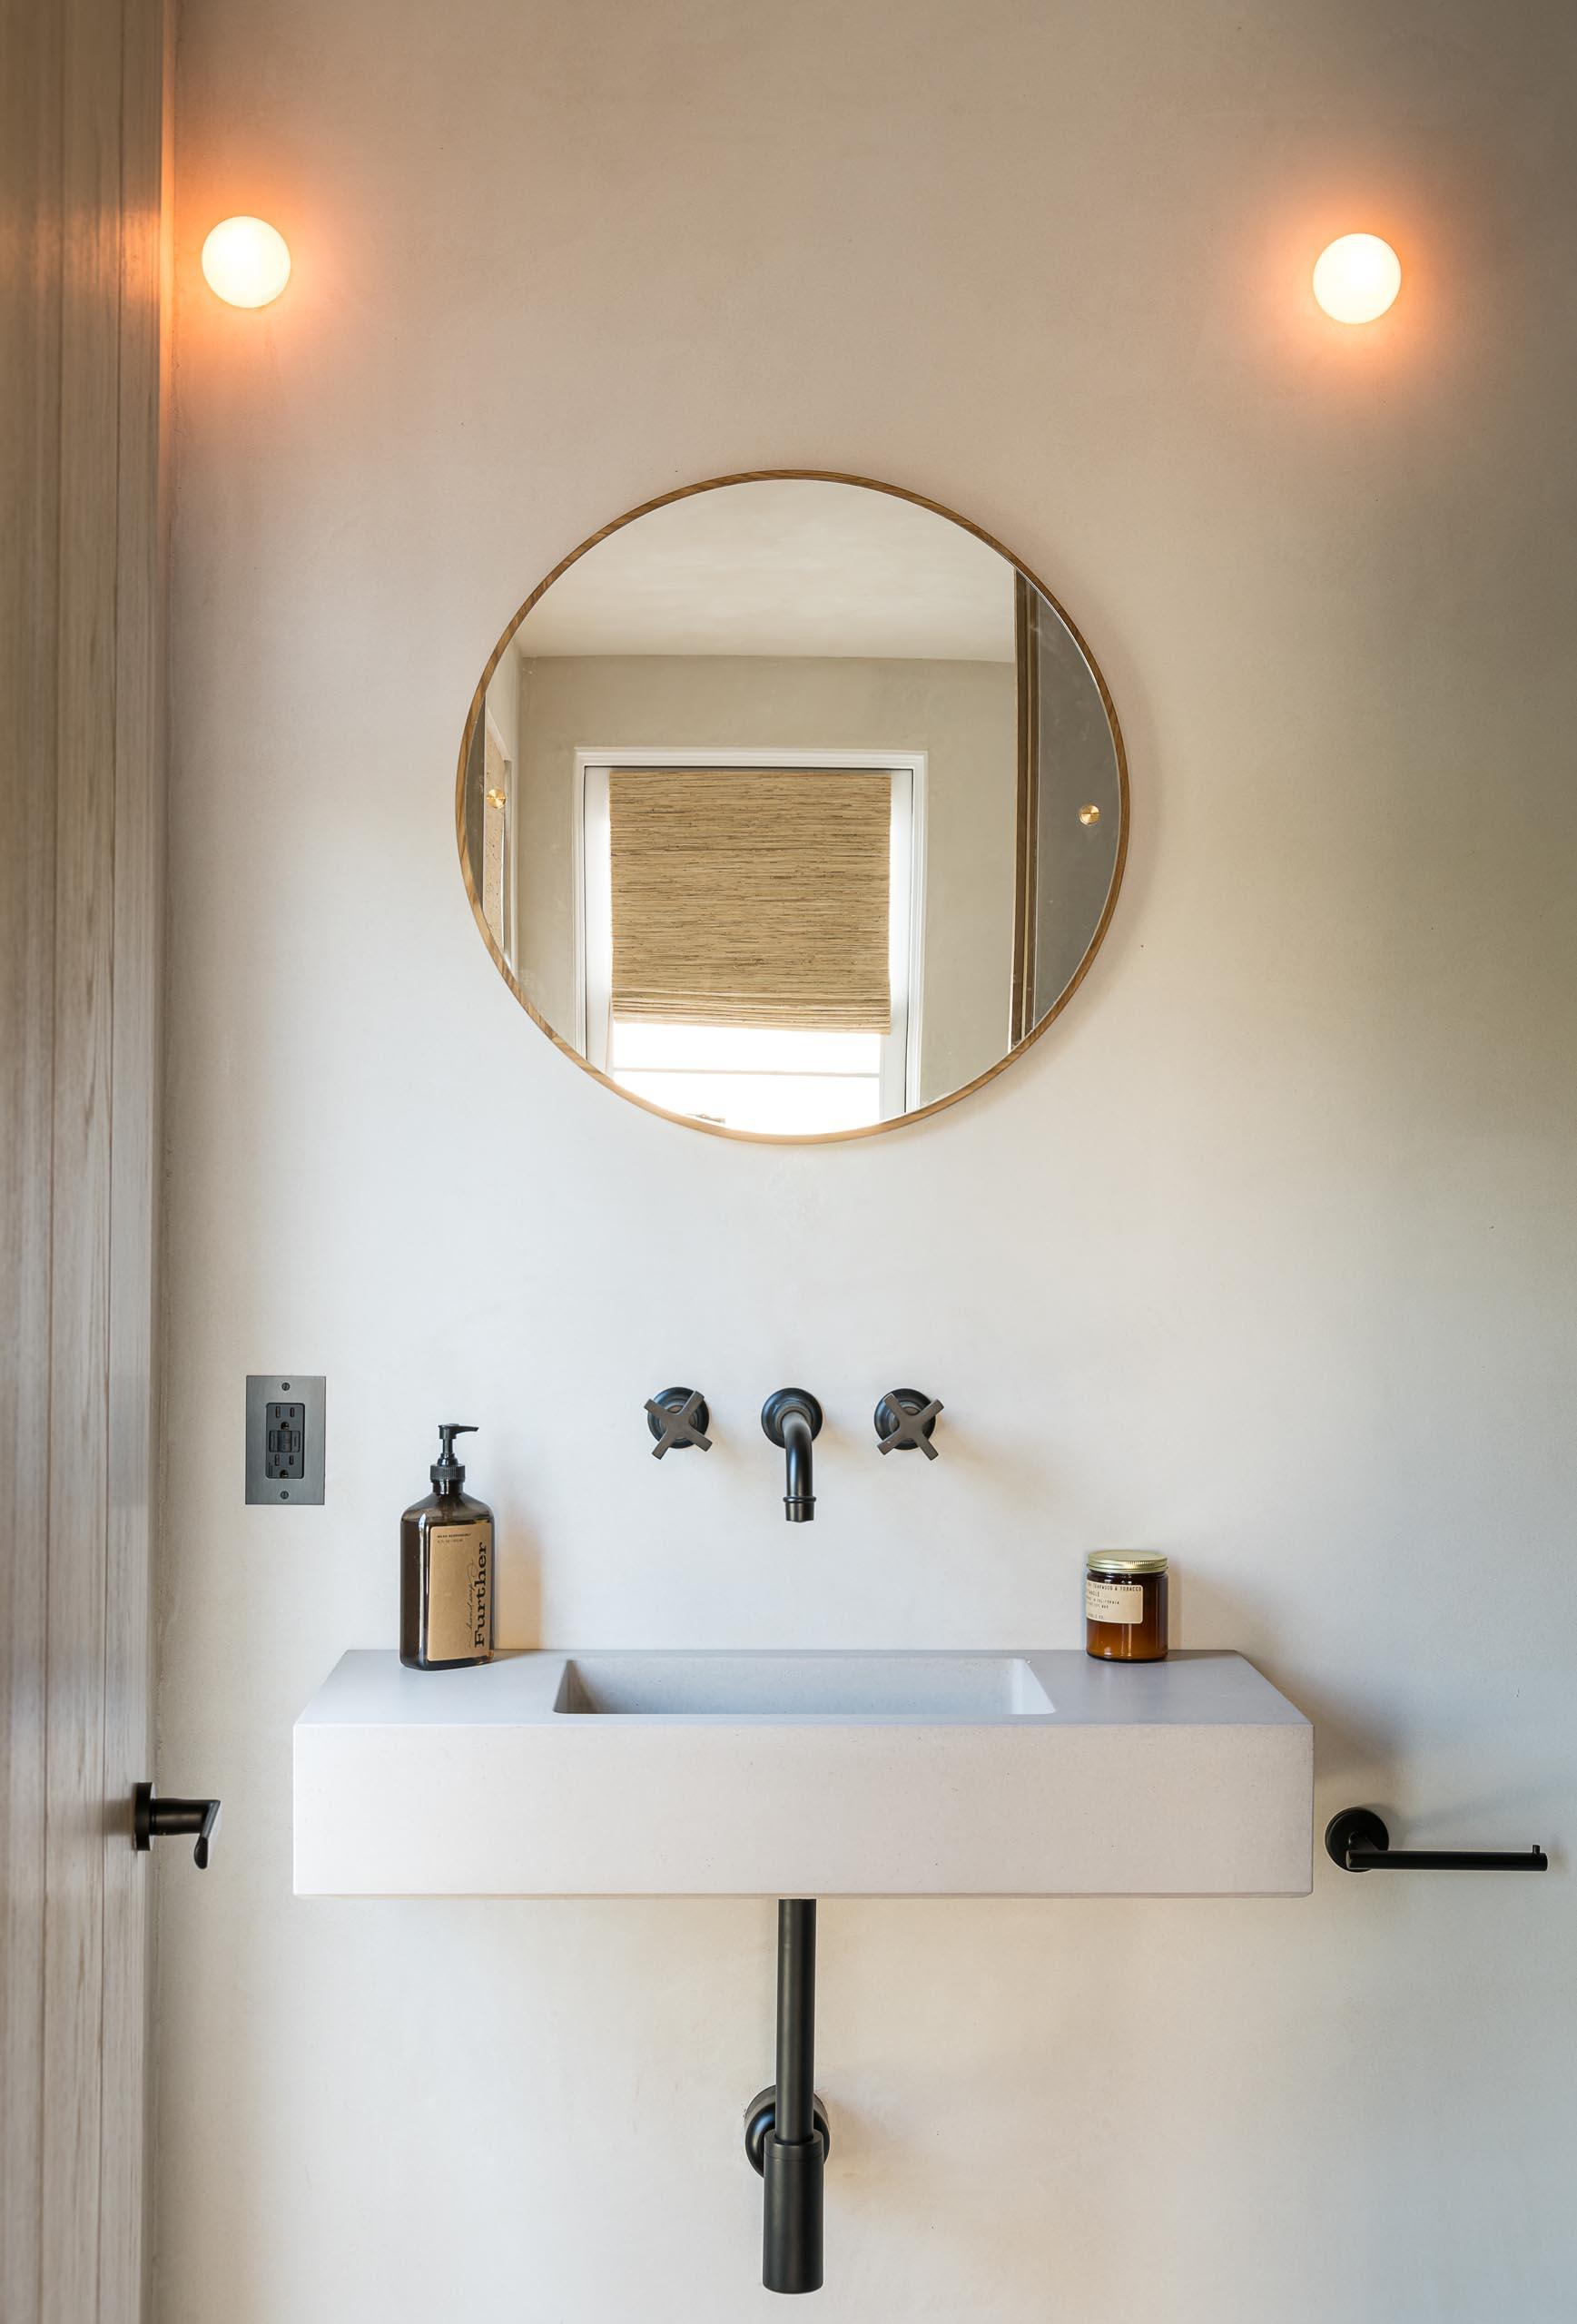 A minimalist bathroom sink with a round mirror and black hardware.